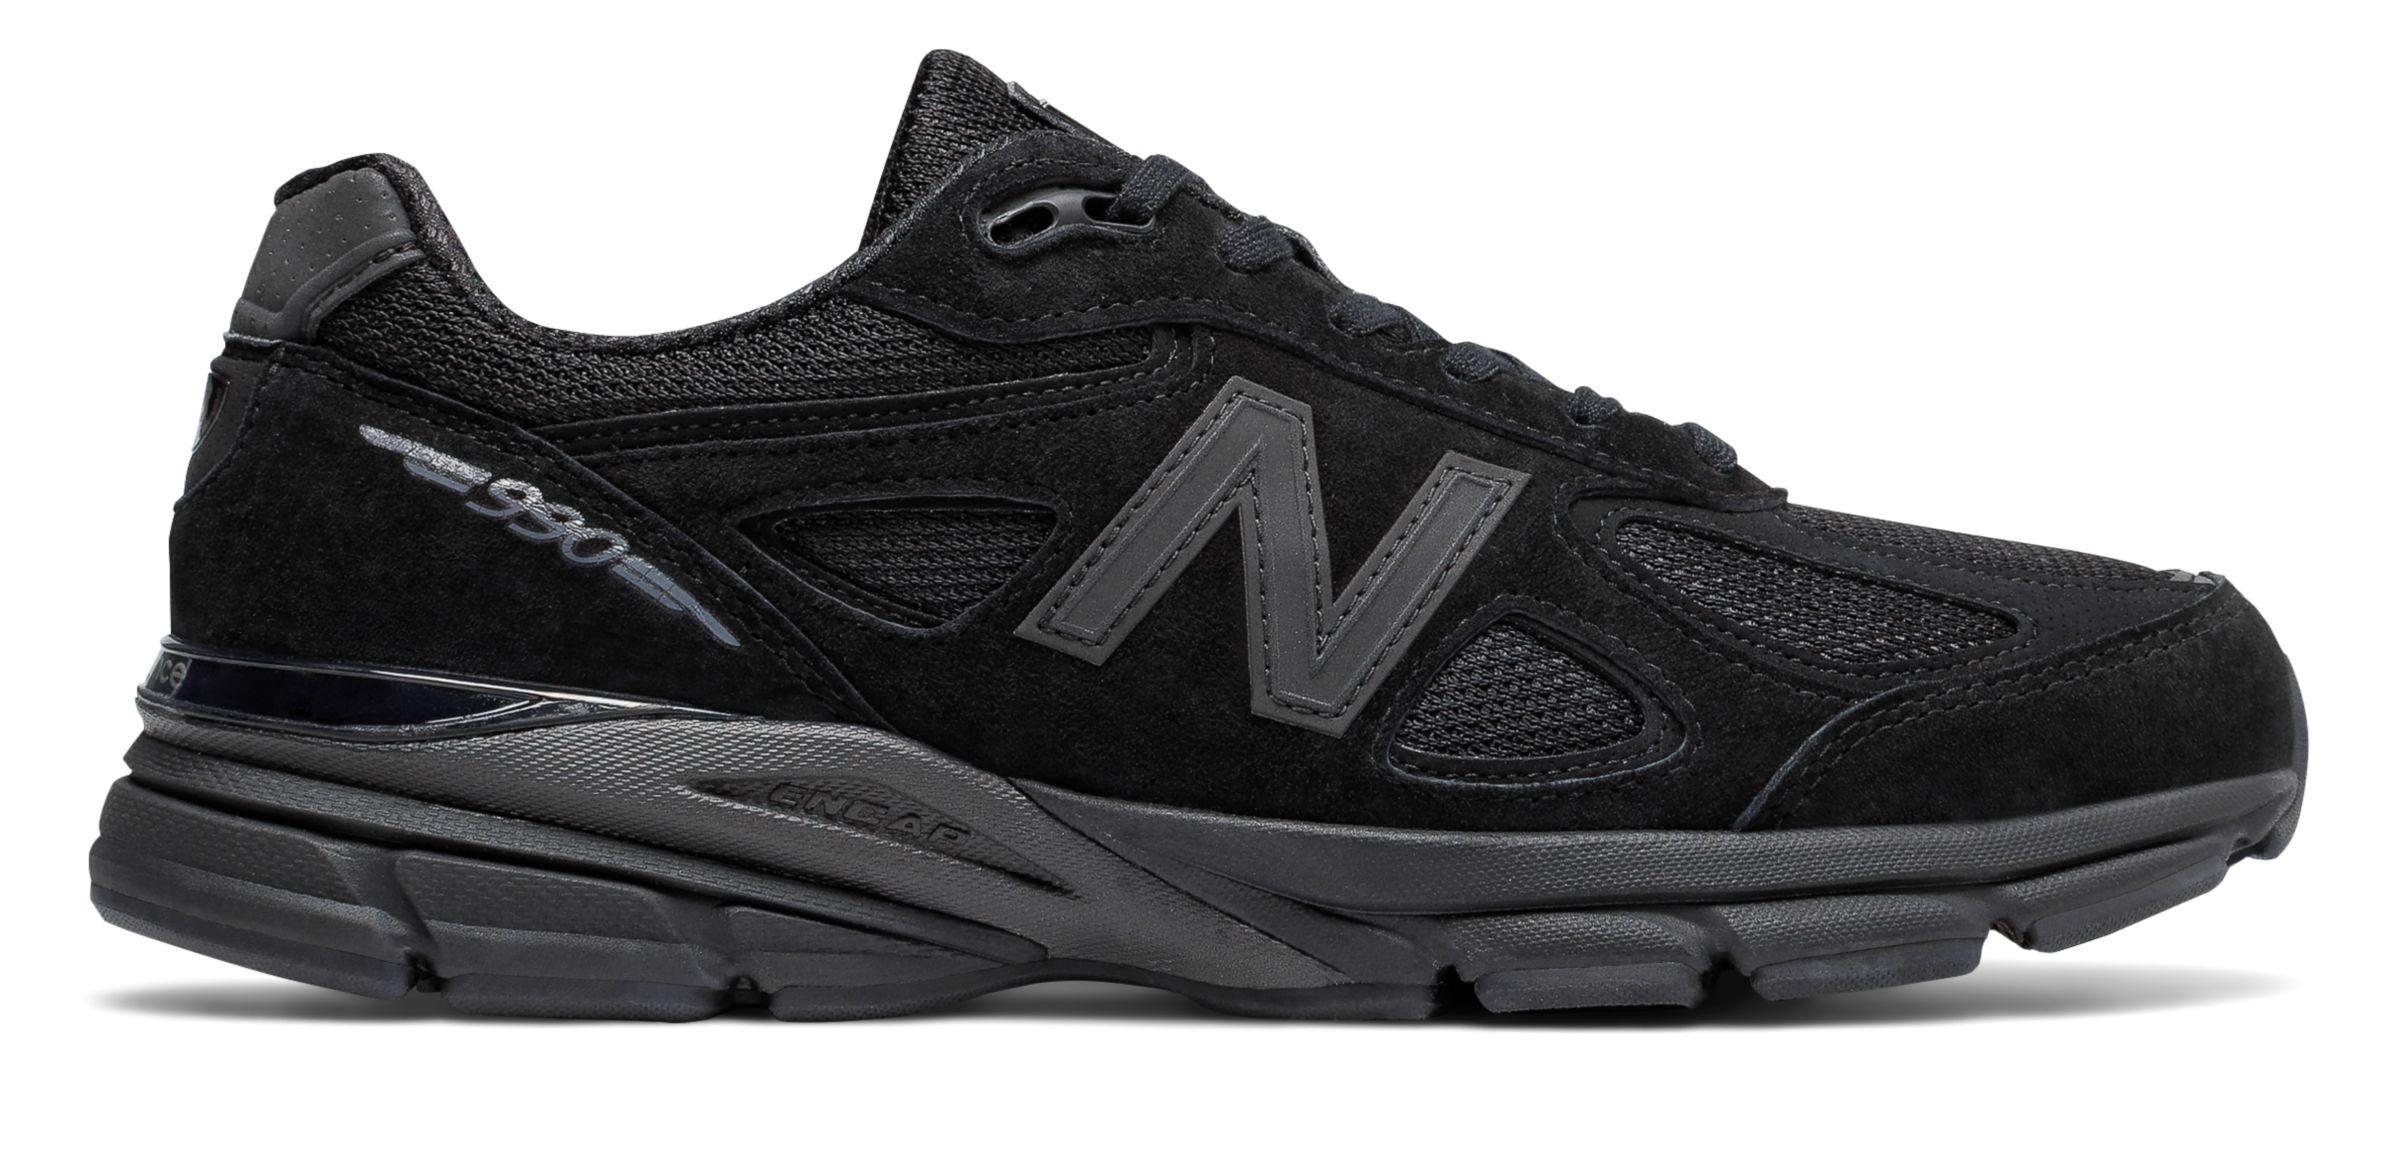 NB New Balance 990v4, Black